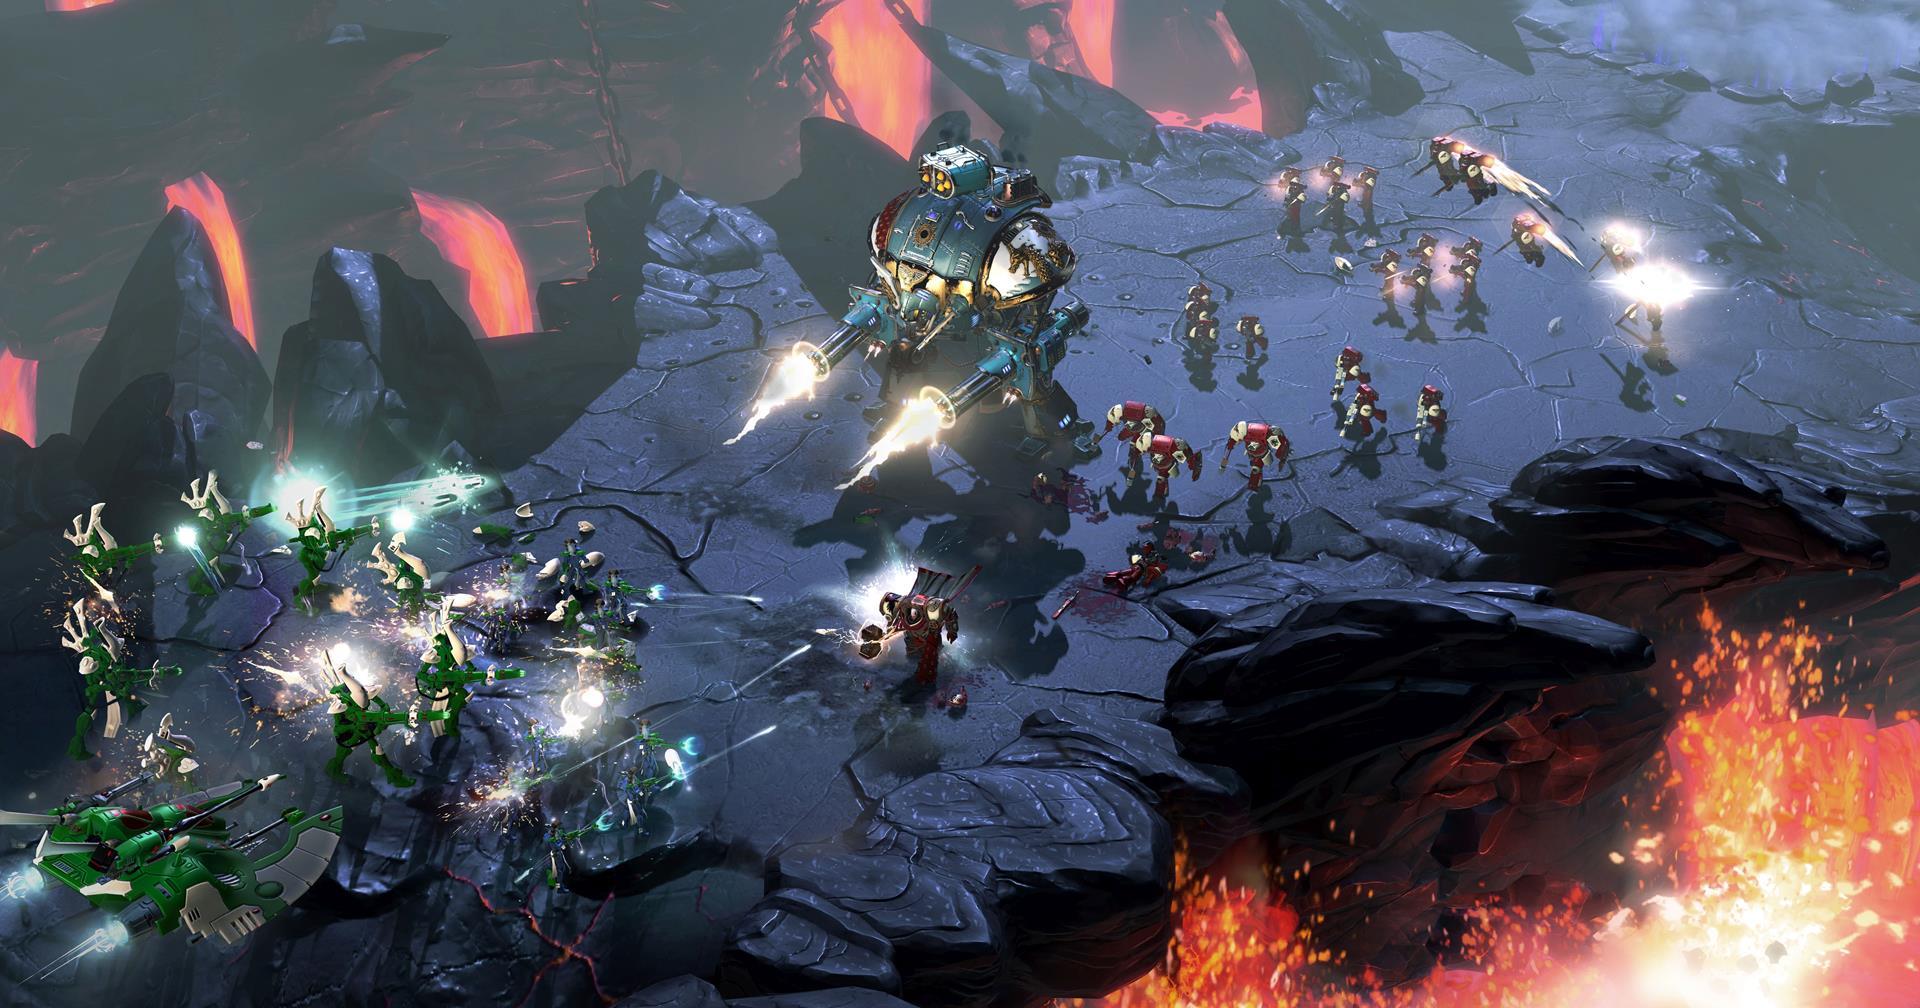 Warhammer 40,000: Dawn of War III big units